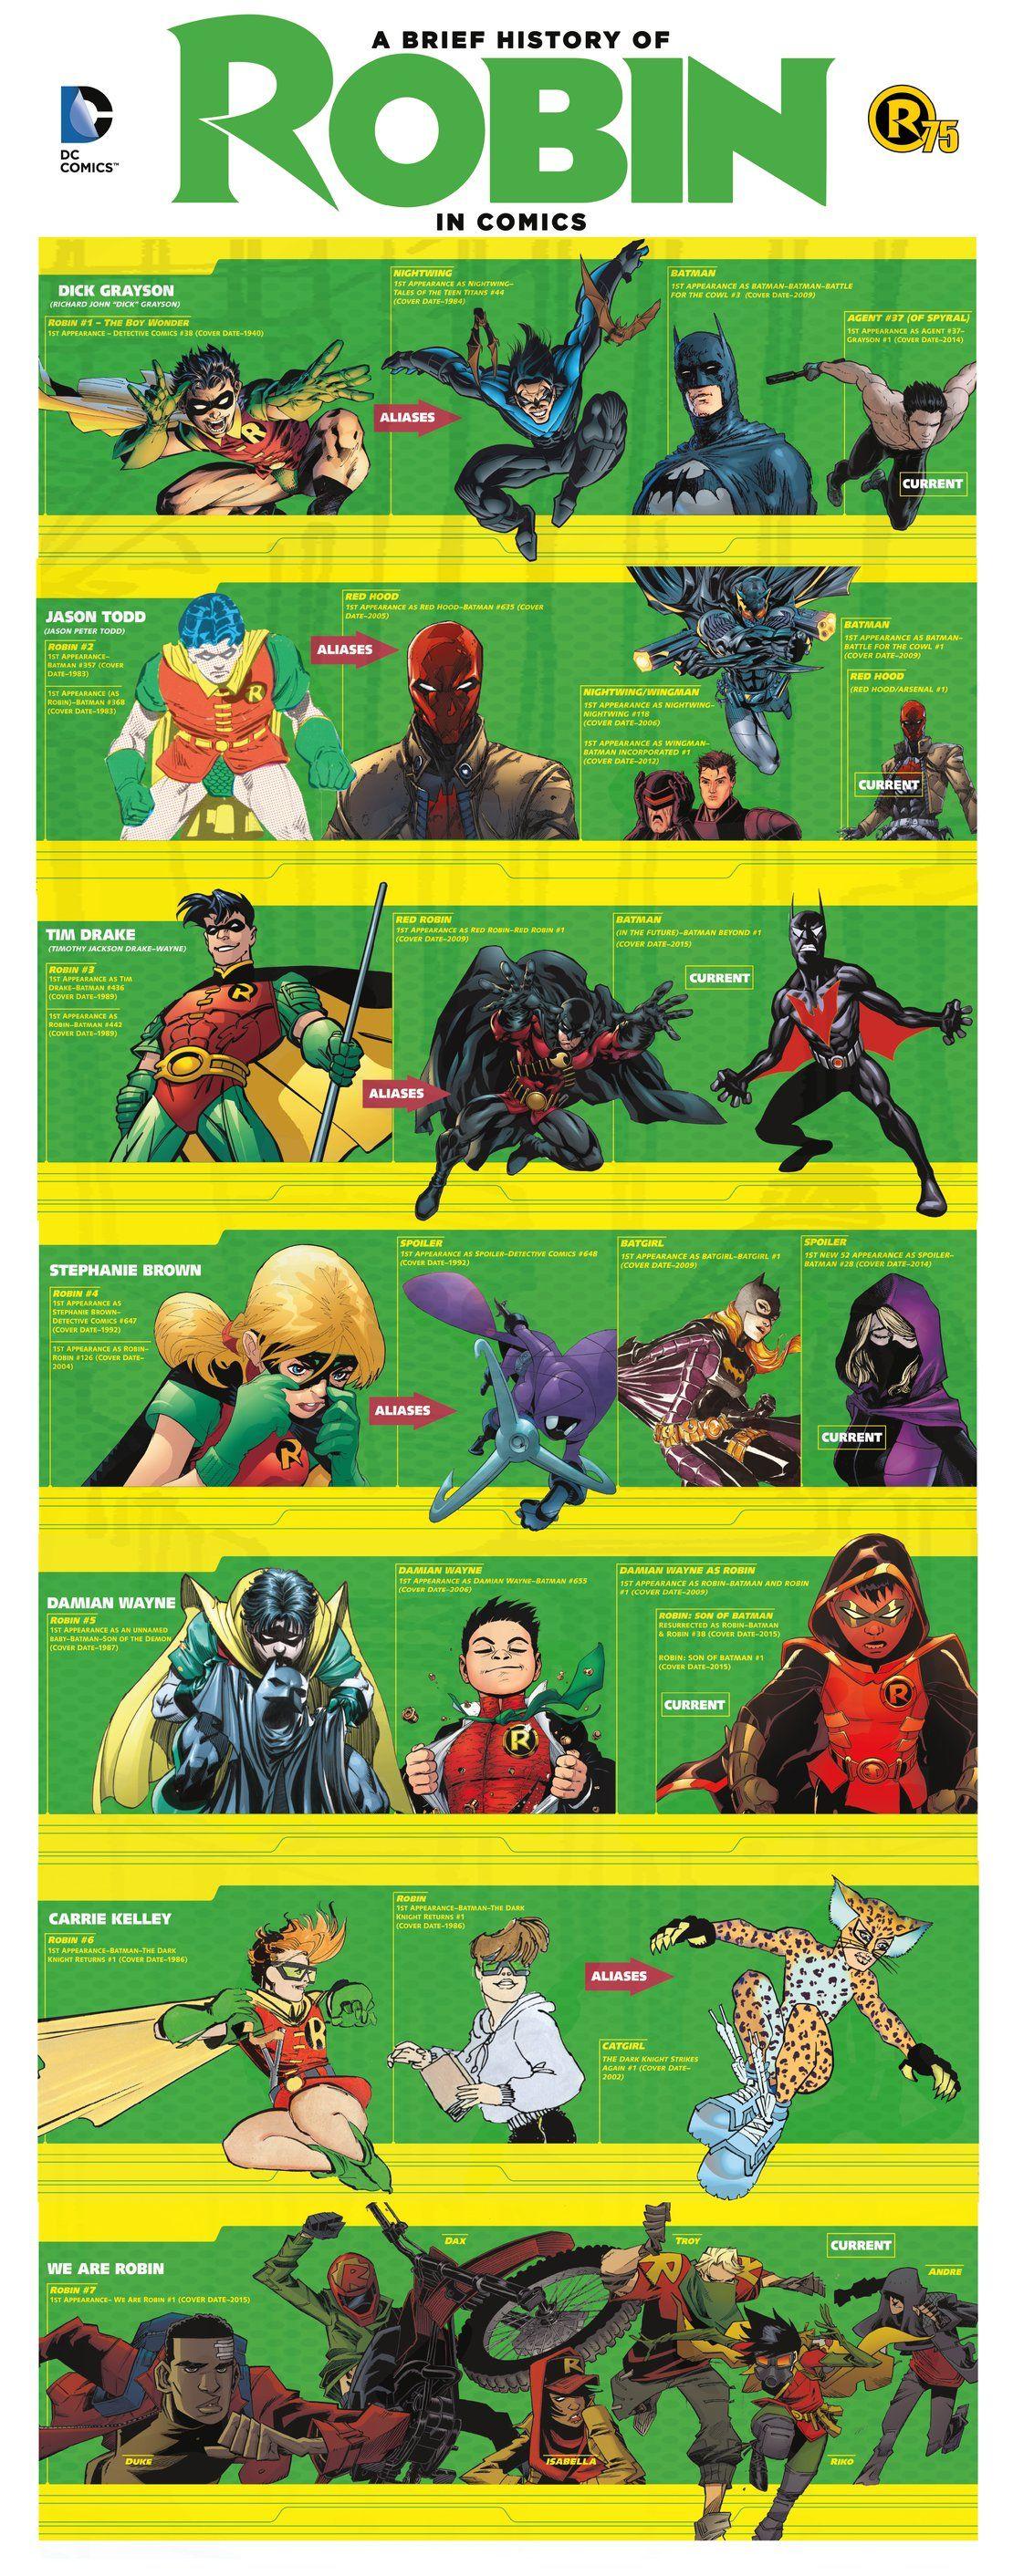 rsz_evolution_of_robin_in_comics_infographic.jpg (1110×2824)